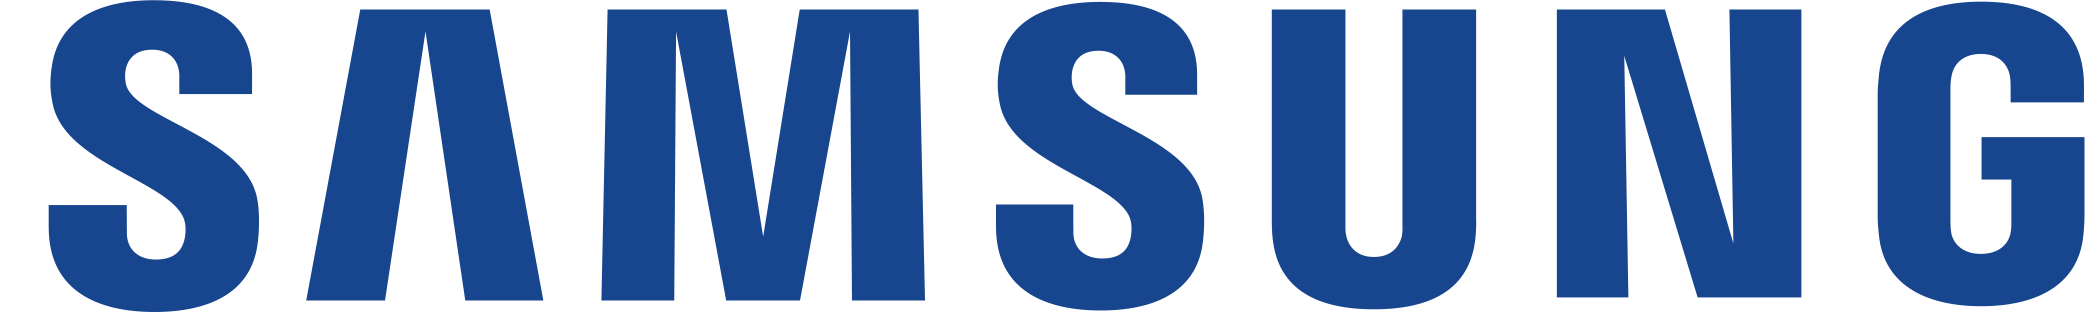 Samsung Logo PNG - 33080